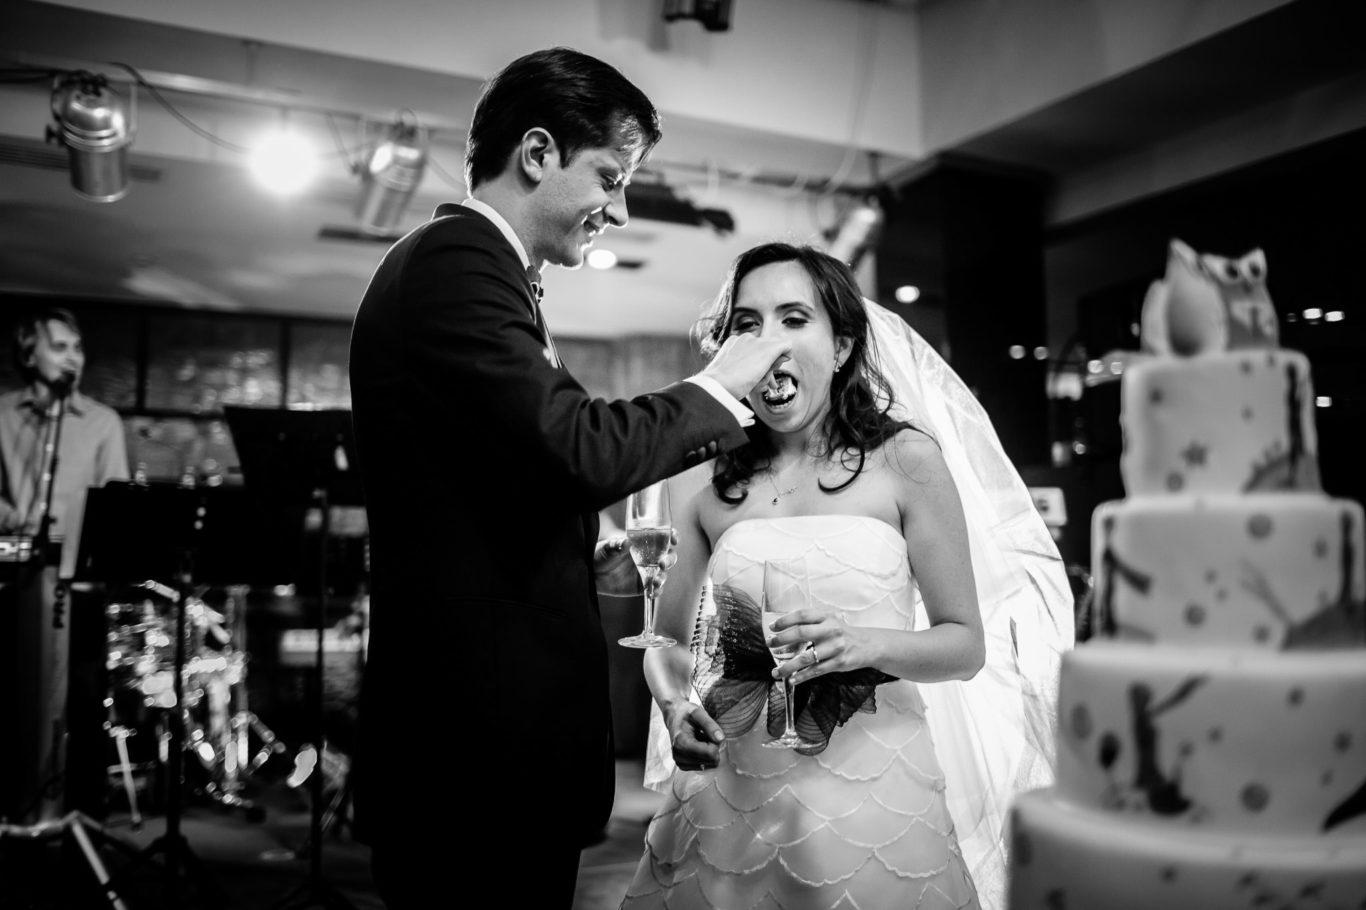 1028-Fotografie-nunta-Simona-Valentin-fotograf-Ciprian-Dumitrescu-CDF_0430